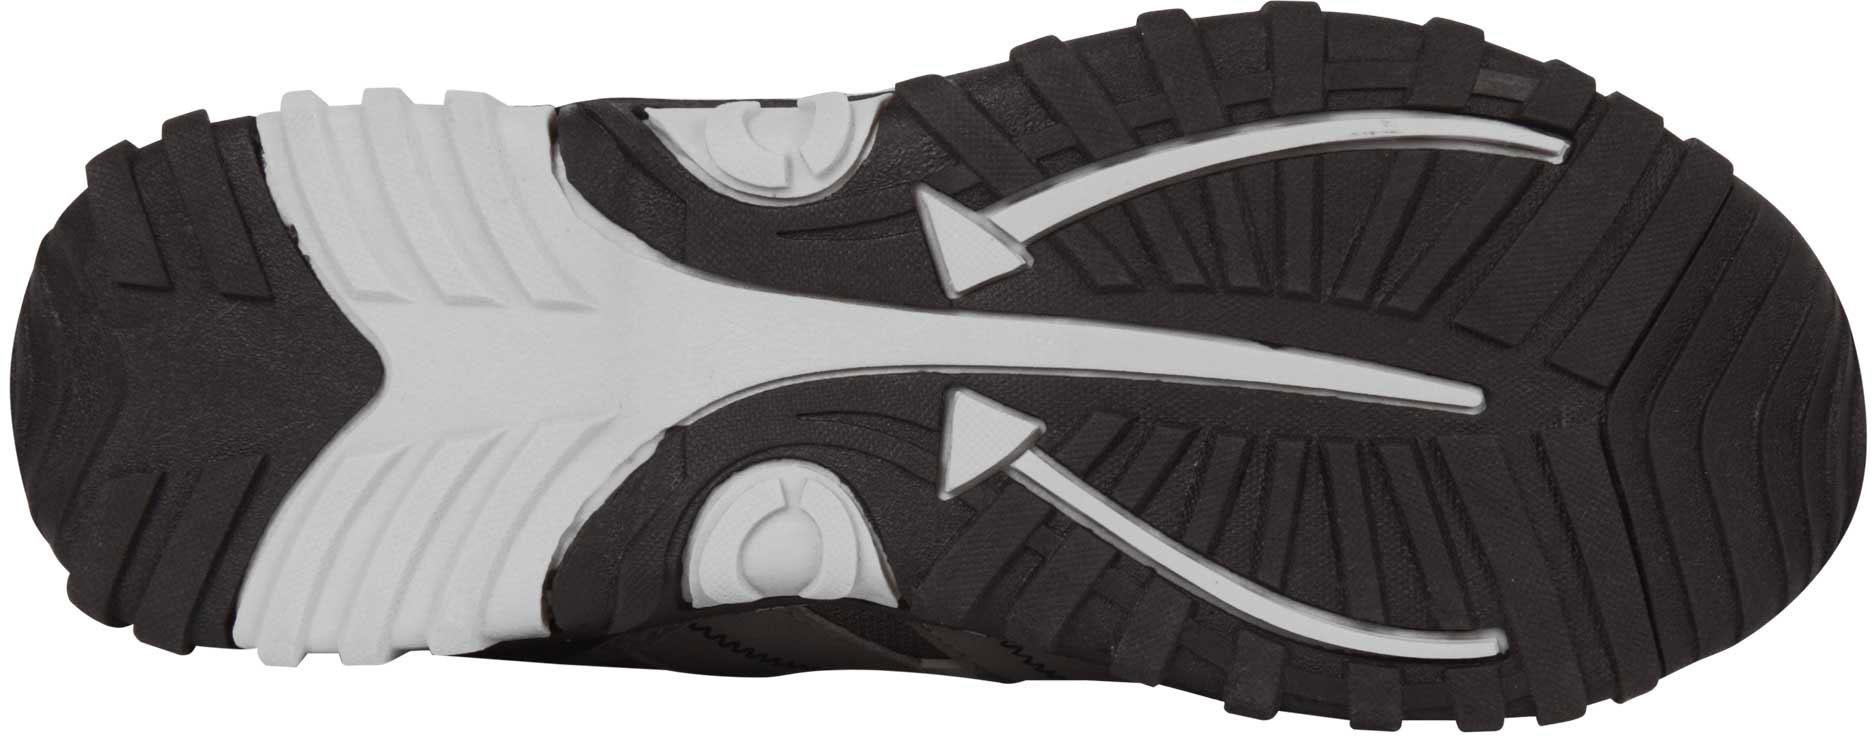 24f03fc814ff Crossroad MERCI. Pánské trekové sandály. Pánské trekové sandály. 1